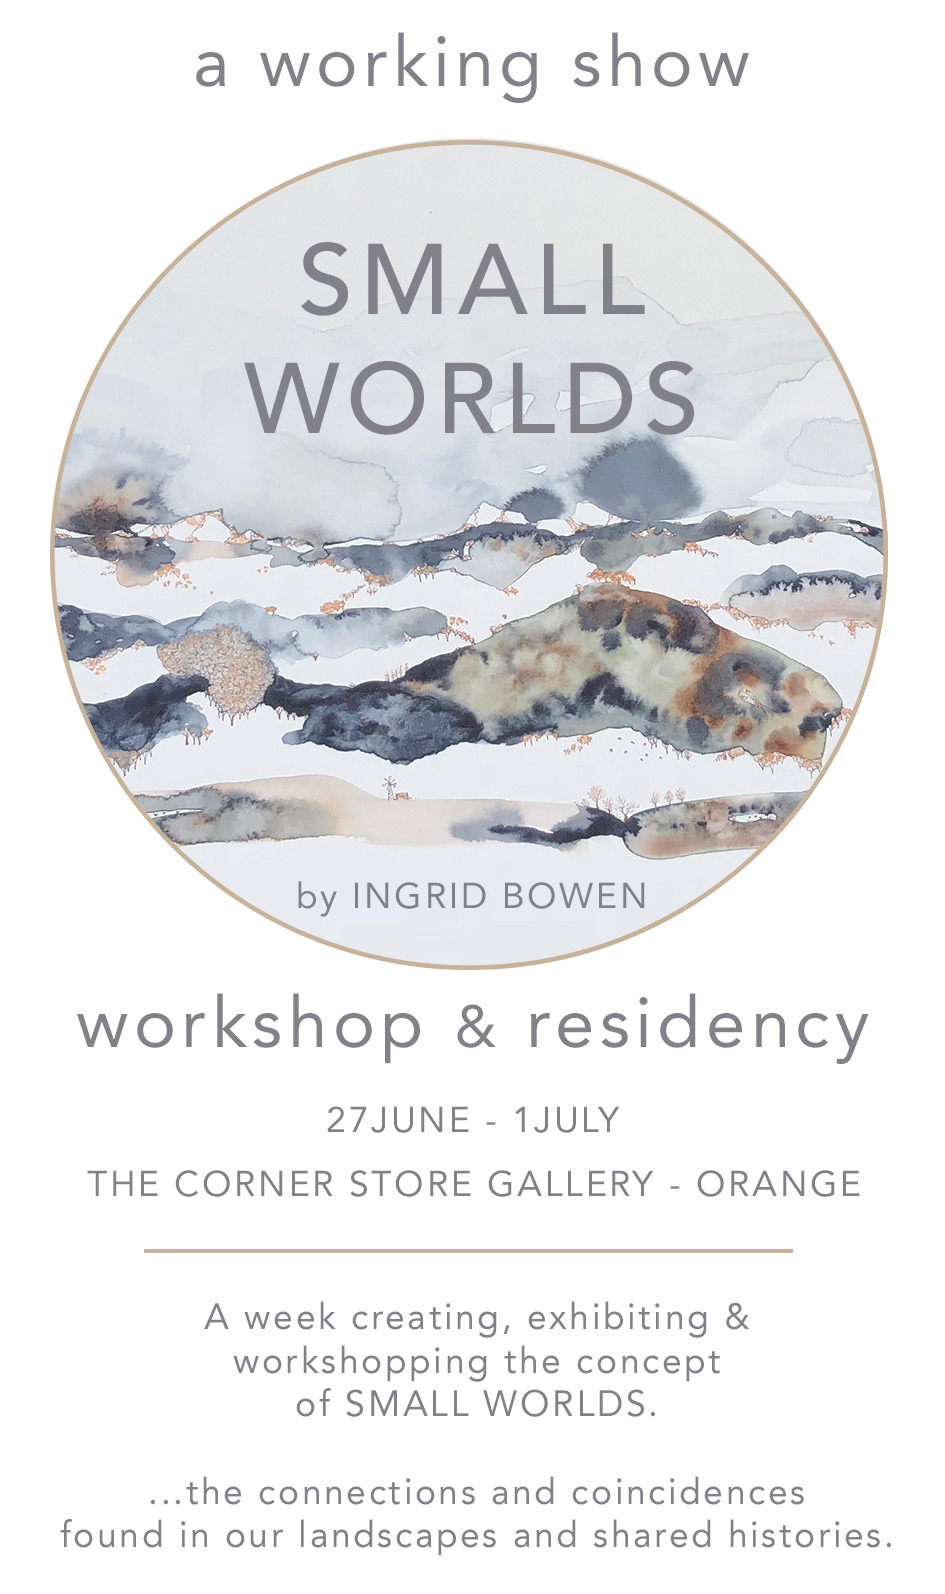 Ingrid Bowen - The Corner Store Gallery